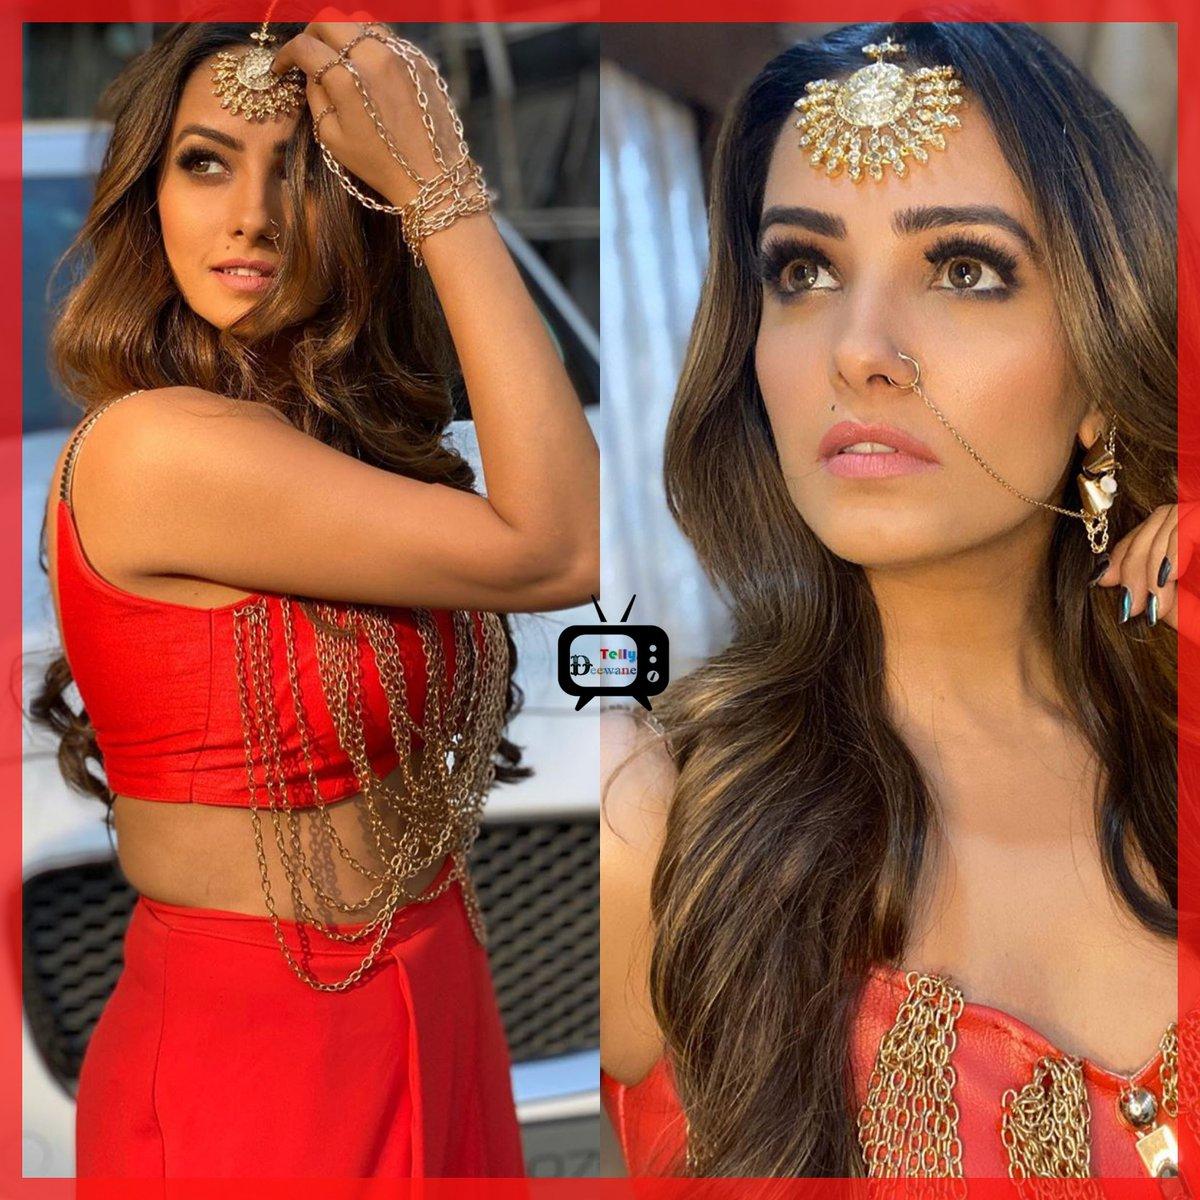 Gorgeous Anita Hassanandani #AnitaHassanandani #Naagin4  #AnitaHassanandaniReddy #Vishaka #Vish  #Naagin3   @TellyDeewanepic.twitter.com/AXj25YVVQJ